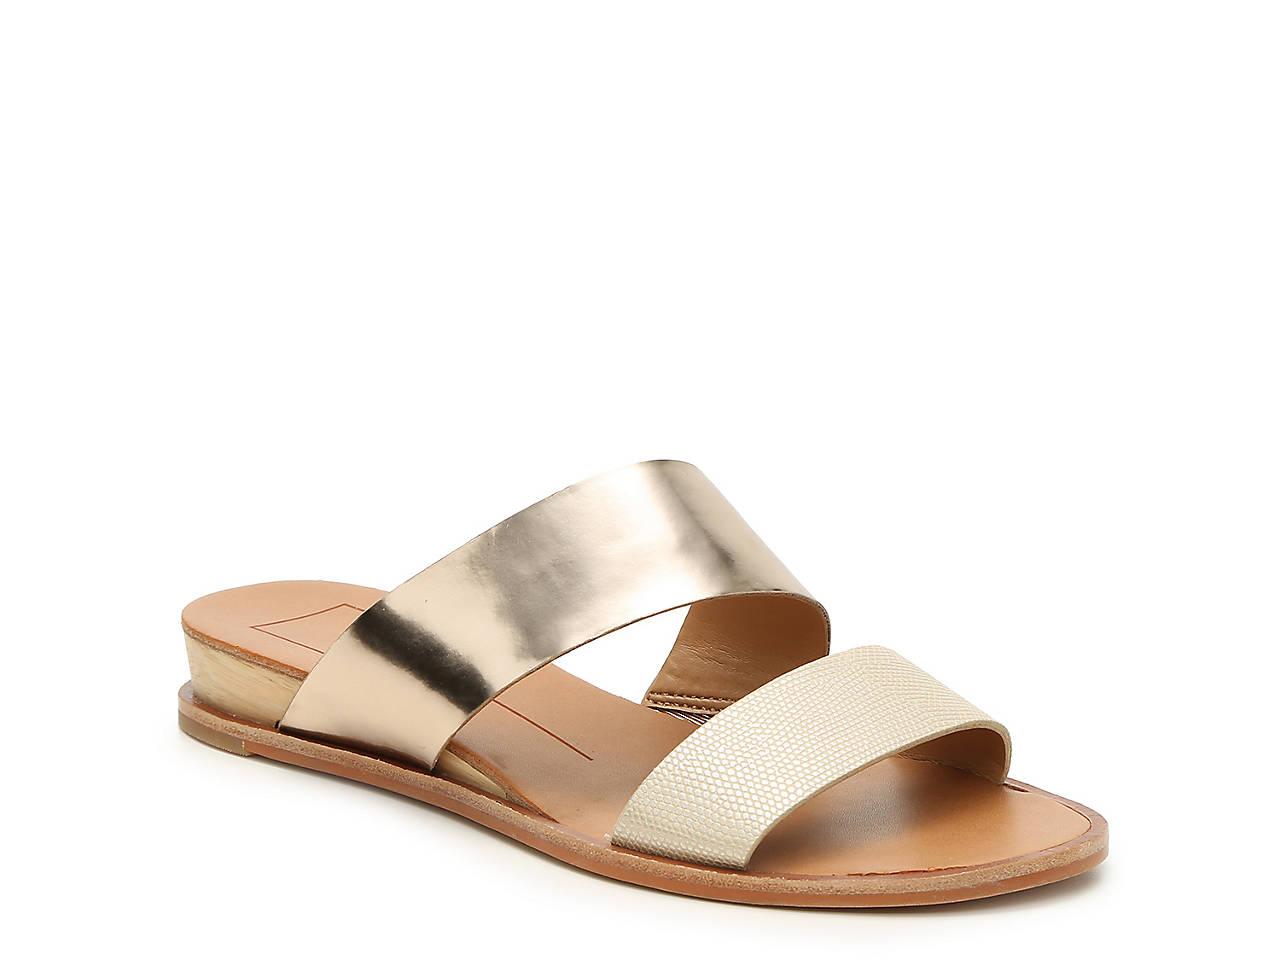 3879cf422 Dolce Vita Paci Wedge Sandal Women's Shoes | DSW